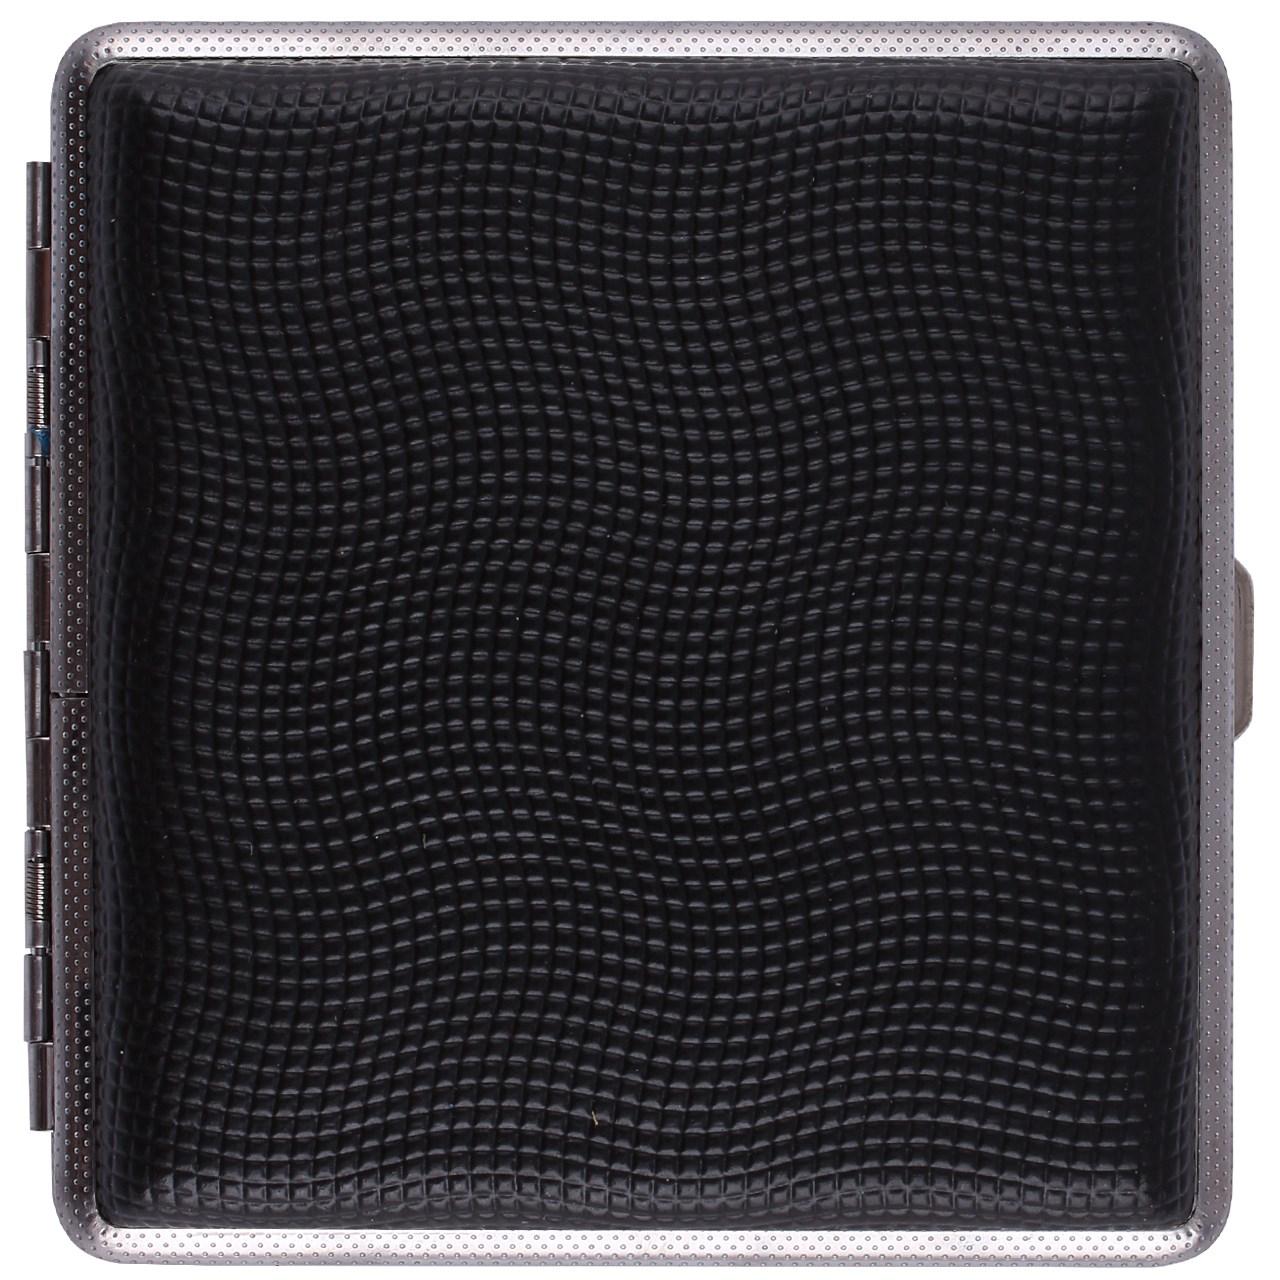 جاسیگاری واته مدل Ophone4